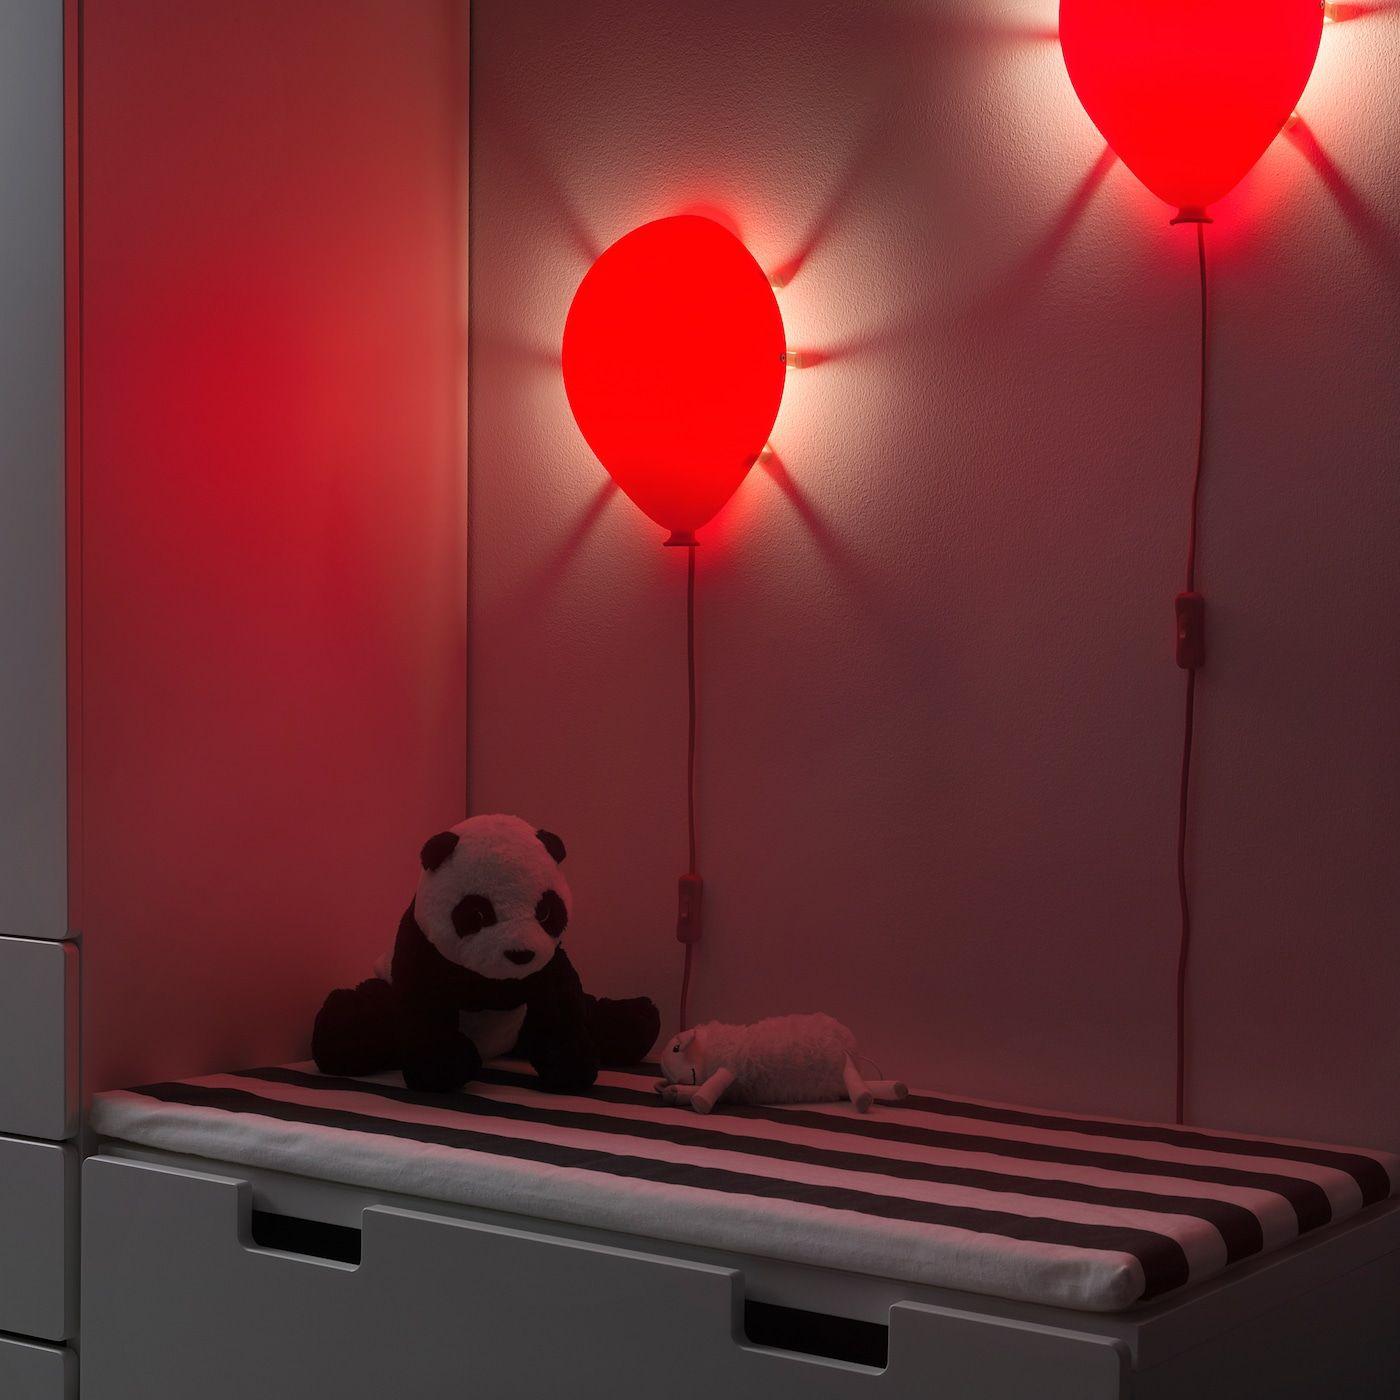 Ikea Dromminge Wandleuchte Ballonlichter Luftballon Lampe